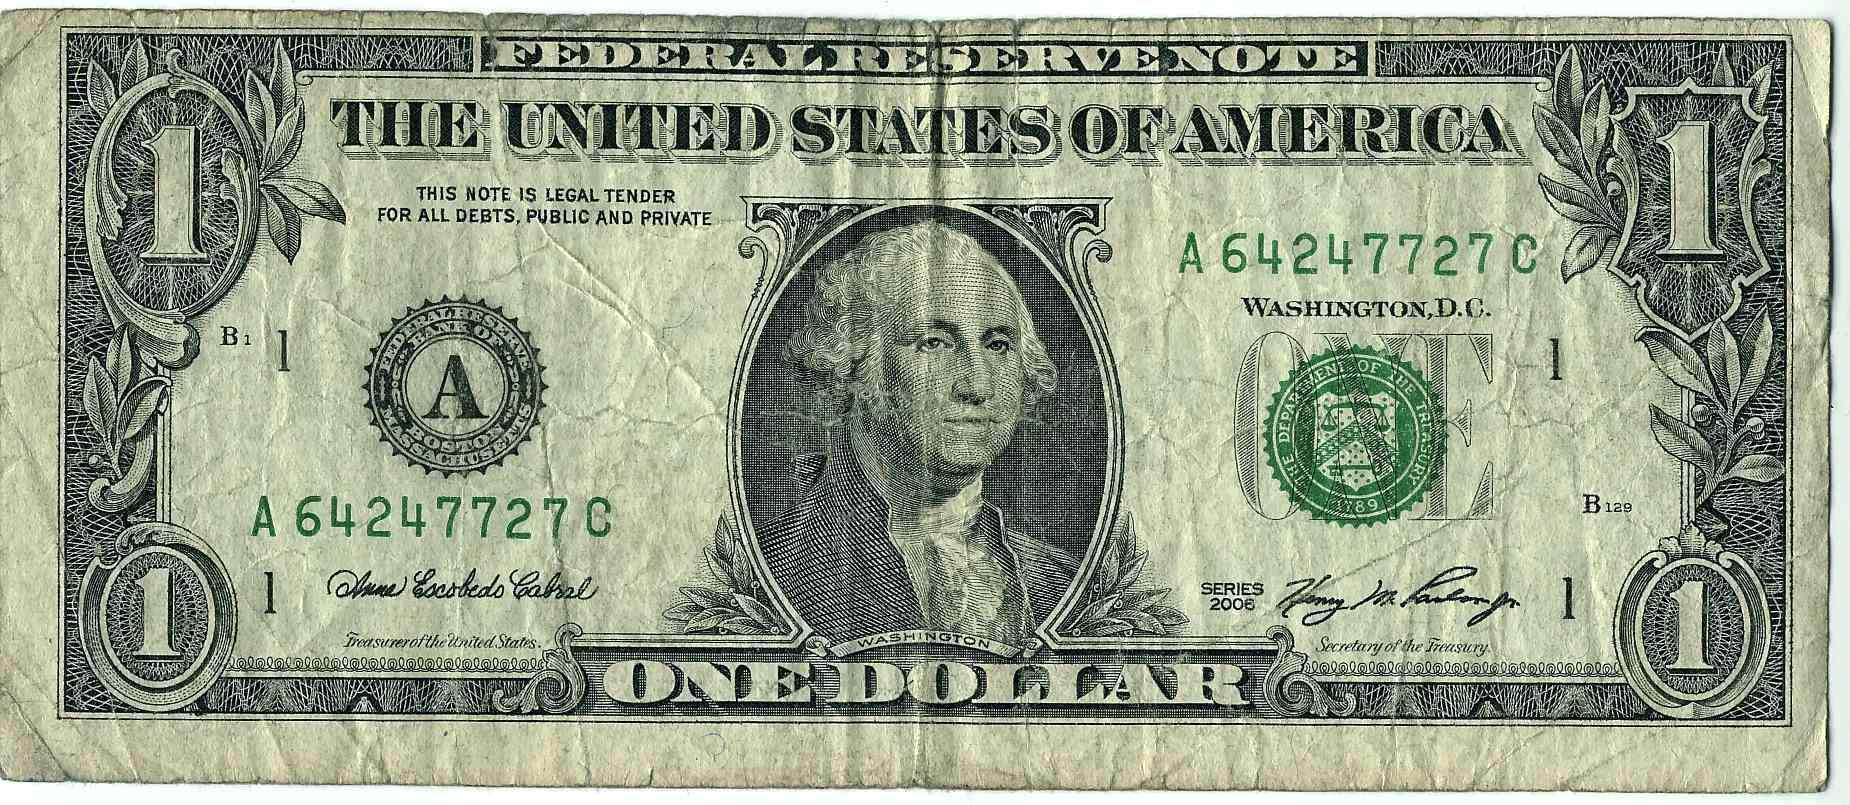 93+ Fake Dollar Bill Printable - Fake Money Printable Australian - Free Printable Play Dollar Bills